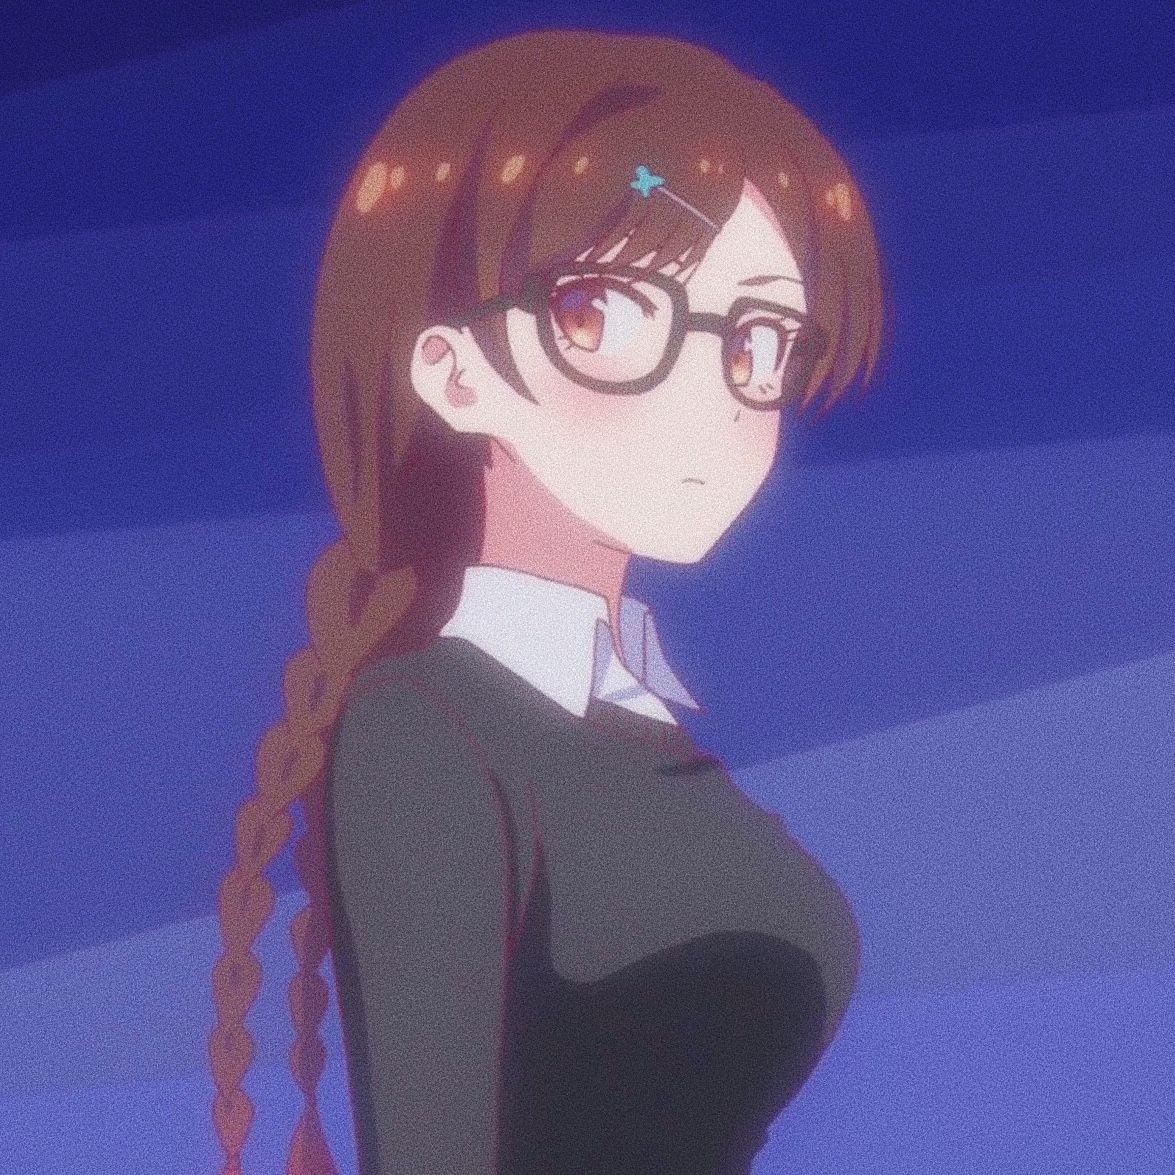 𝙖𝙣𝙞𝙢𝙚 𝙞𝙘𝙤𝙣 𝙢𝙞𝙯𝙪𝙝𝙖𝙧𝙖 𝘩𝘢𝘺𝘶𝘺𝘰𝘵𝘰 ꨄ Cute Anime Pics Anime Anime Icons